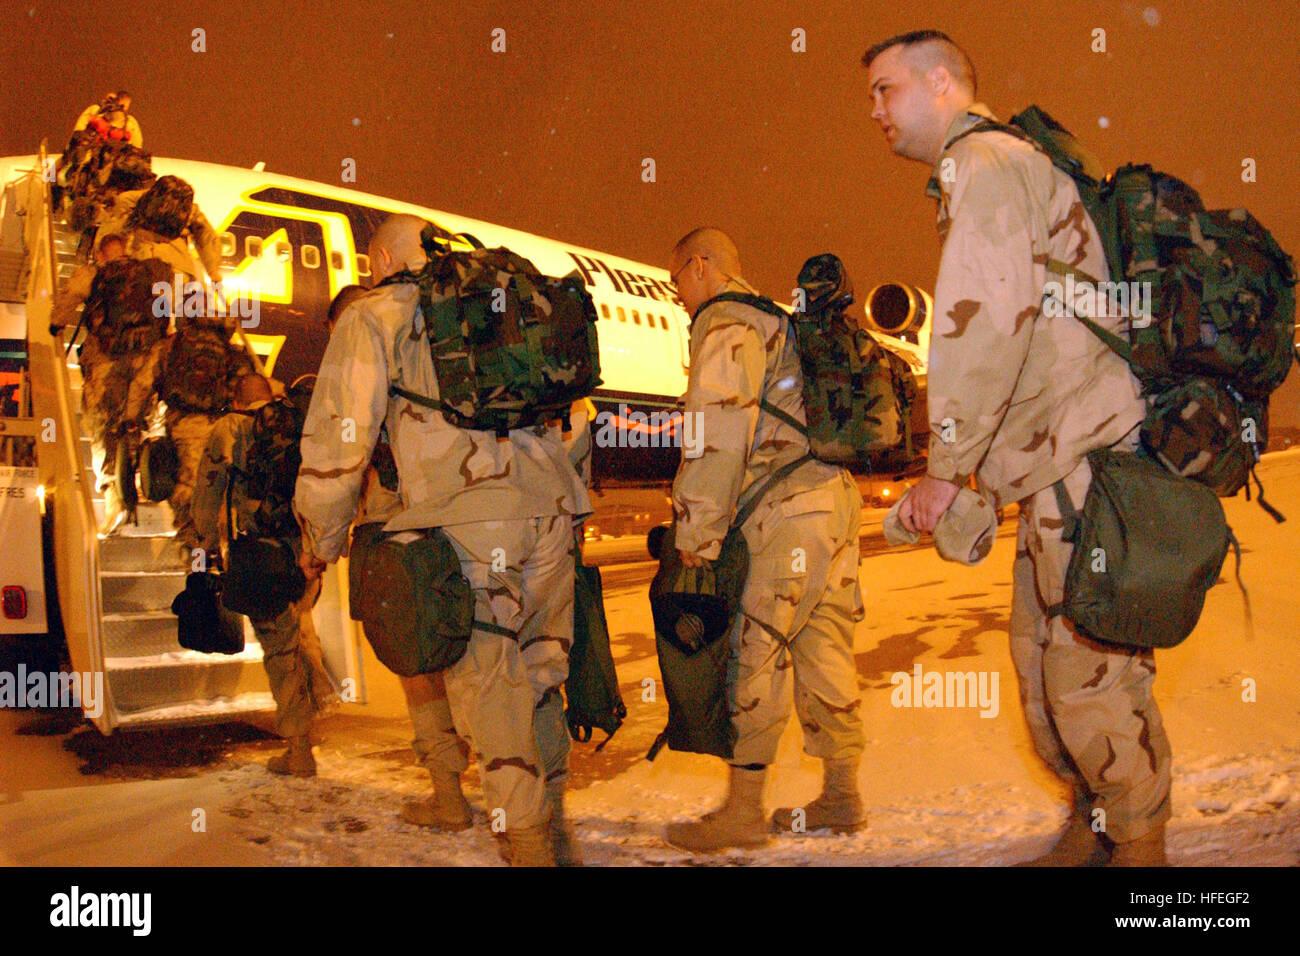 030313-N-5576W-001       Milwaukee, Wis. (Mar. 13, 2003) -- U.S. Marines assigned to Marine Wing Communications - Stock Image